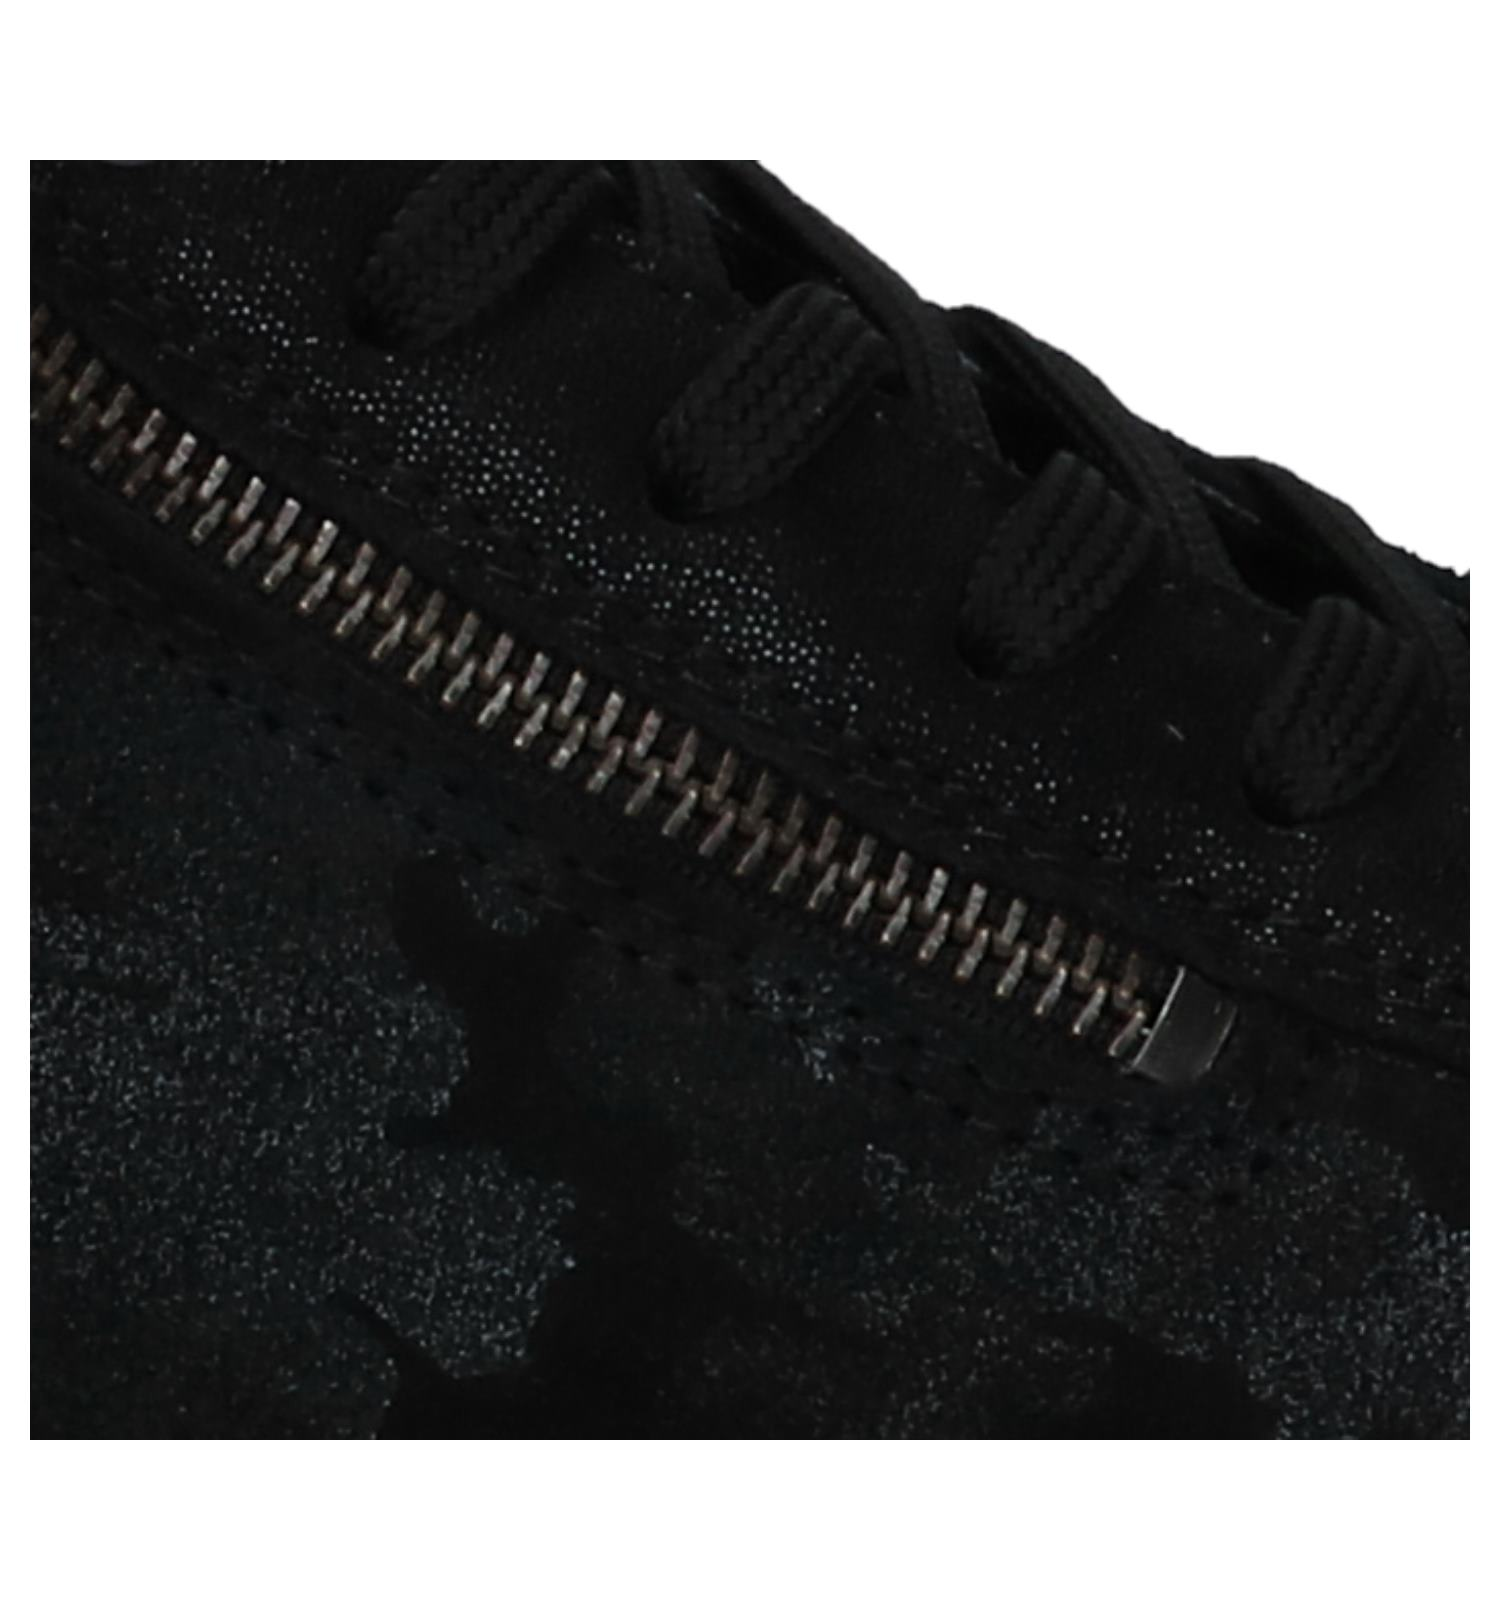 ae9a2d8ce41 Zwarte Hoge Sneakers Mirel Sally   TORFS.BE   Gratis verzend en retour